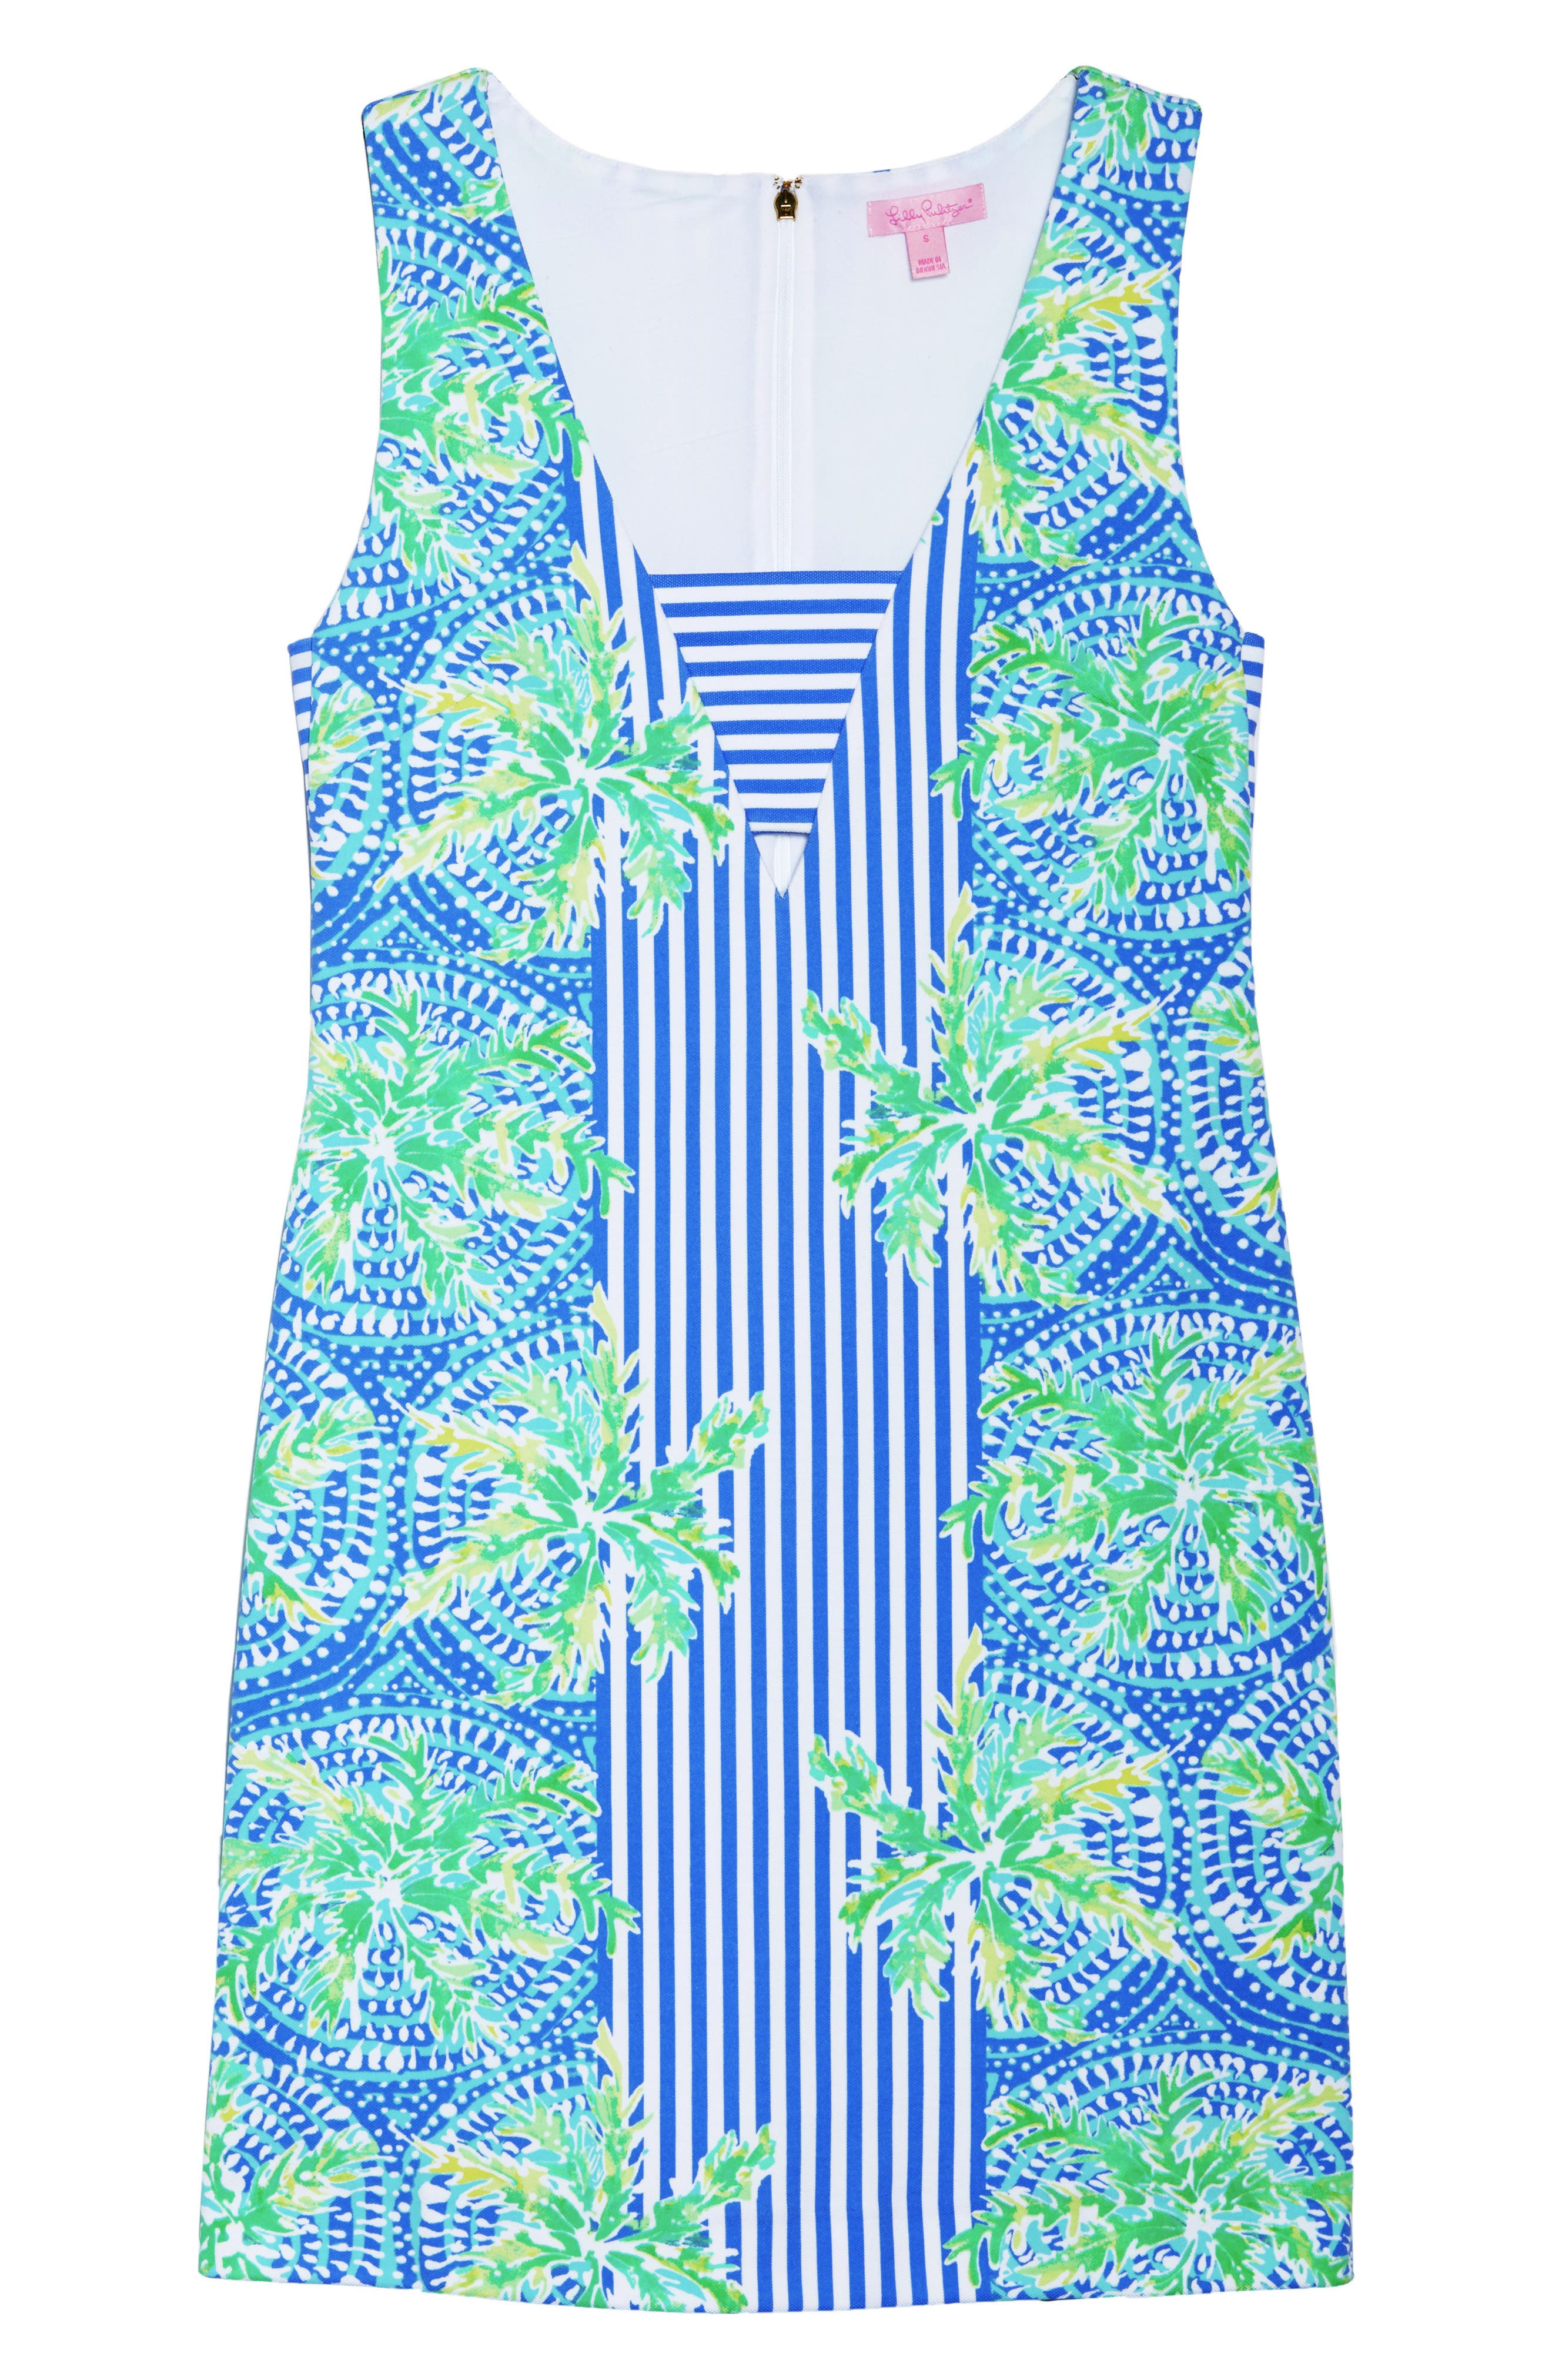 Chiara Stripe & Floral Print Dress,                             Alternate thumbnail 7, color,                             BENNET BLUE TROPIC LIKE ITS